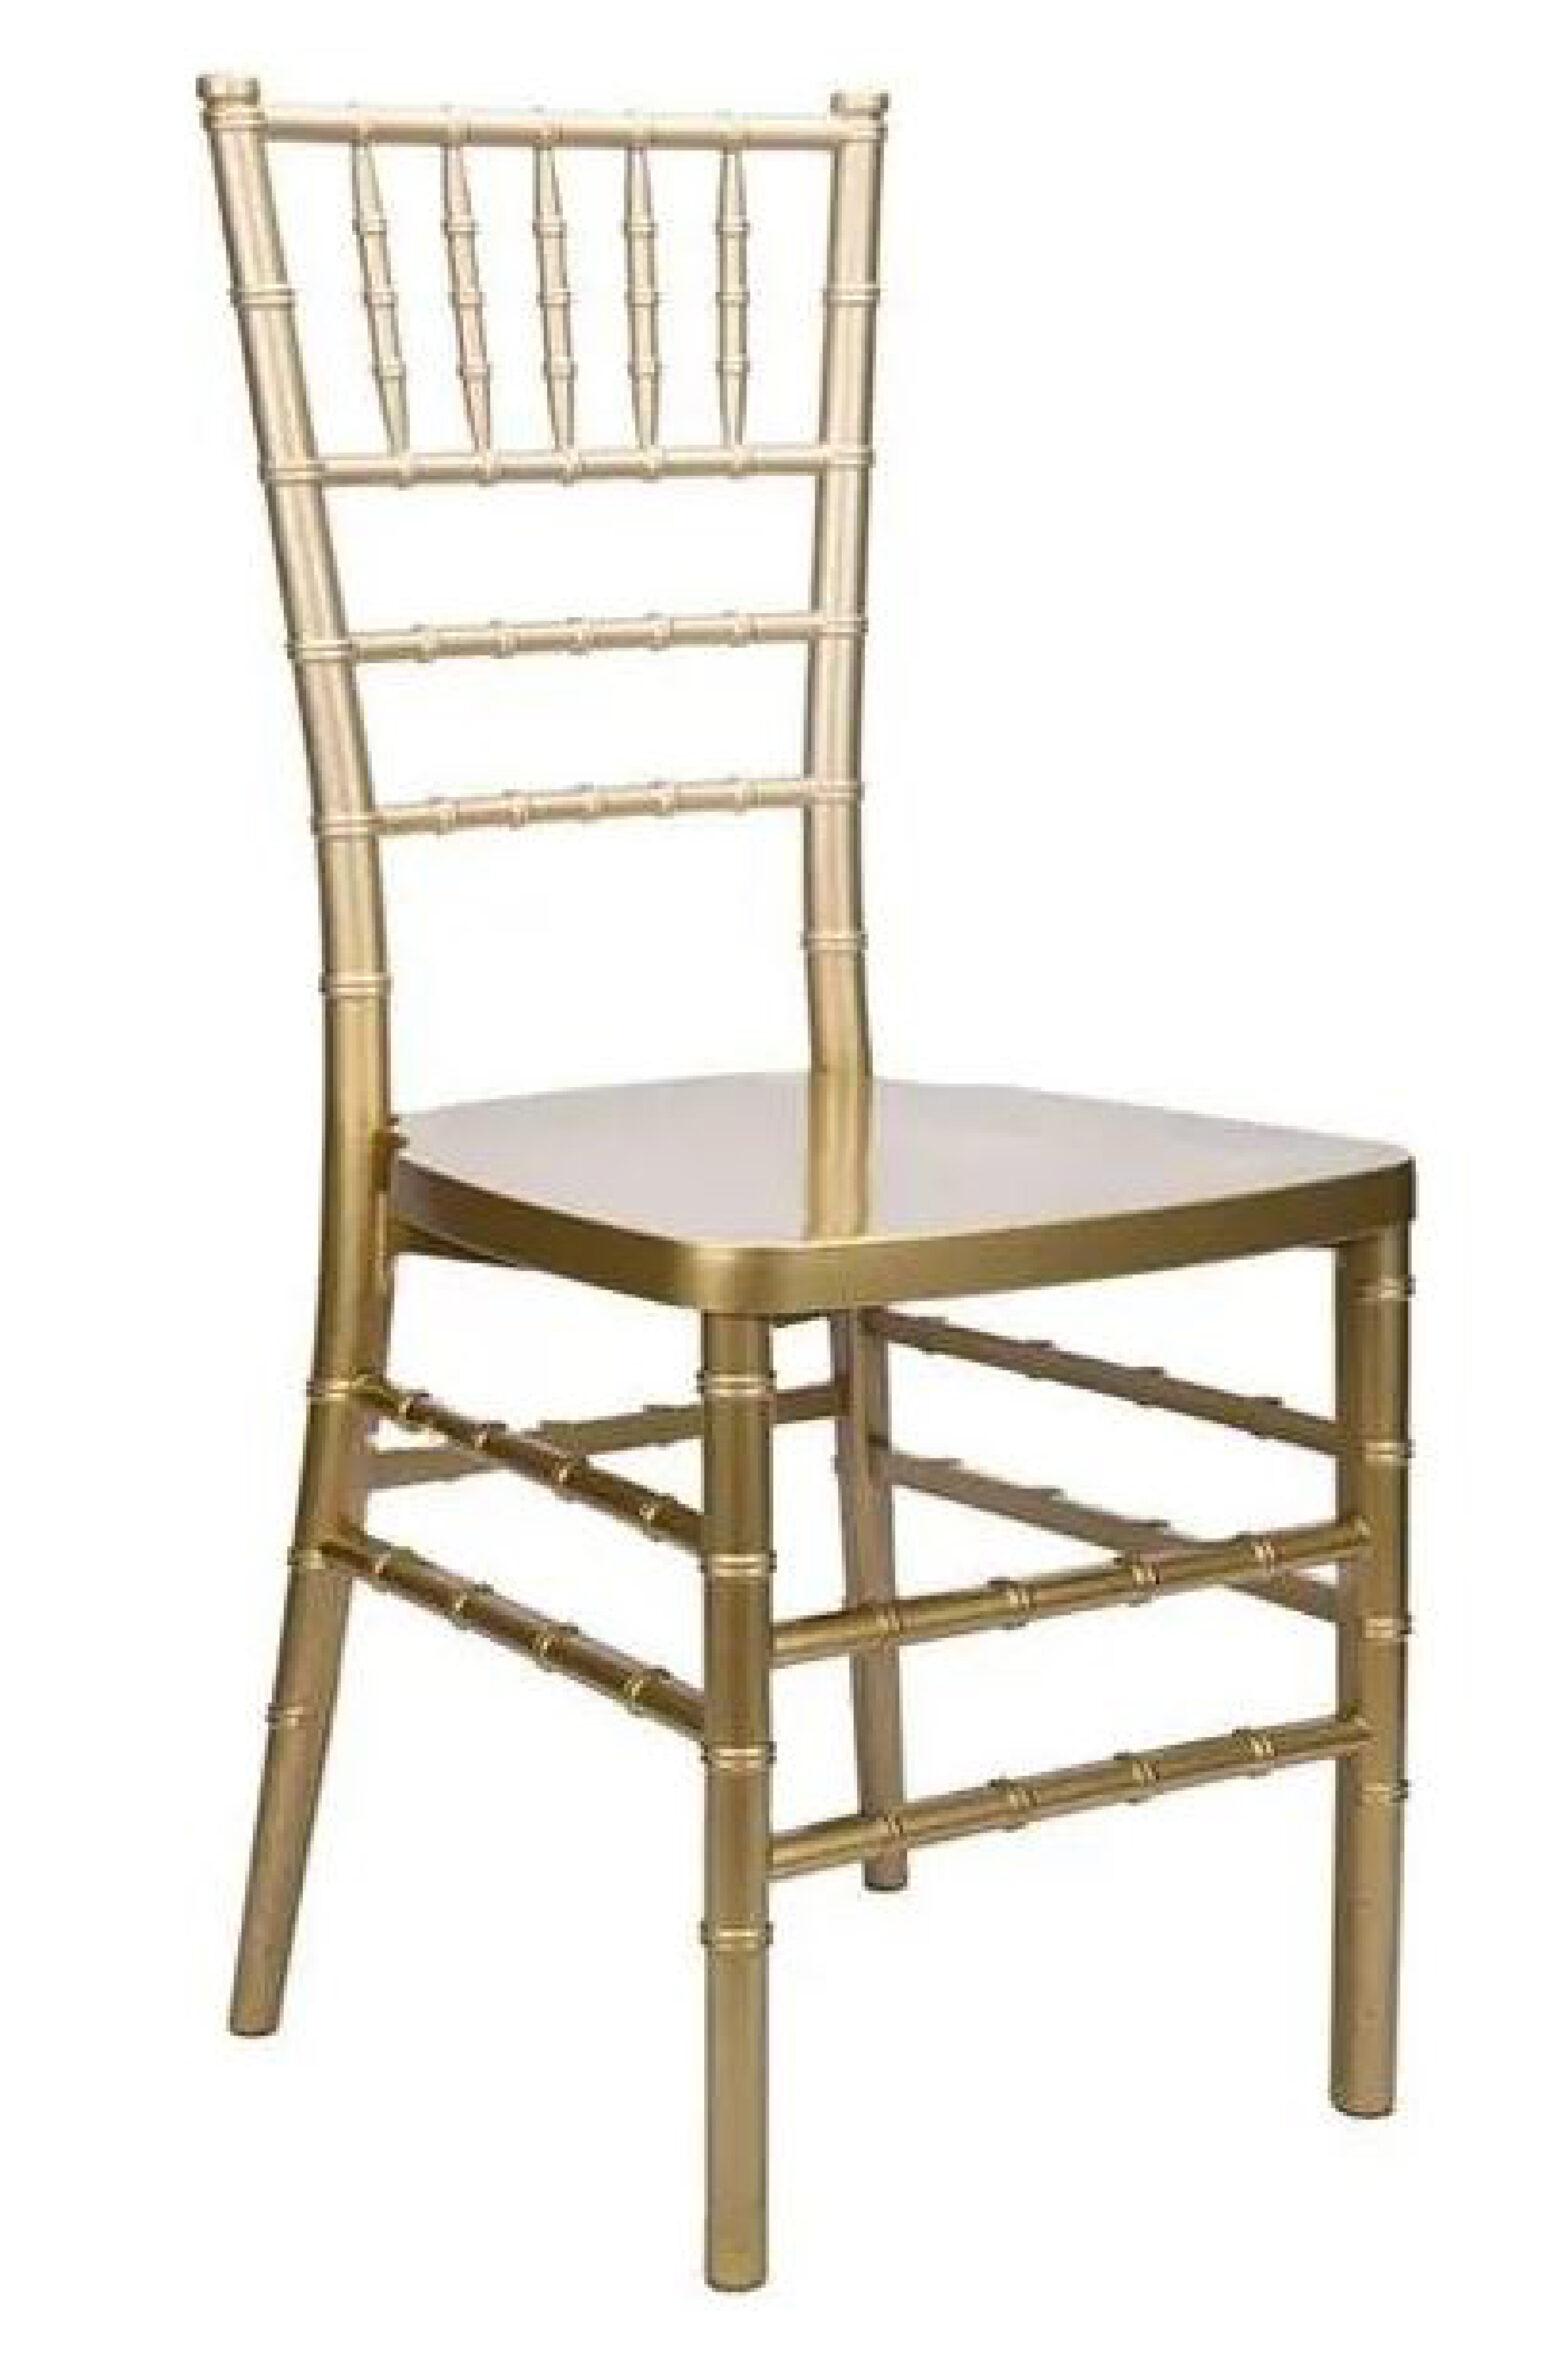 Chair rental Weston